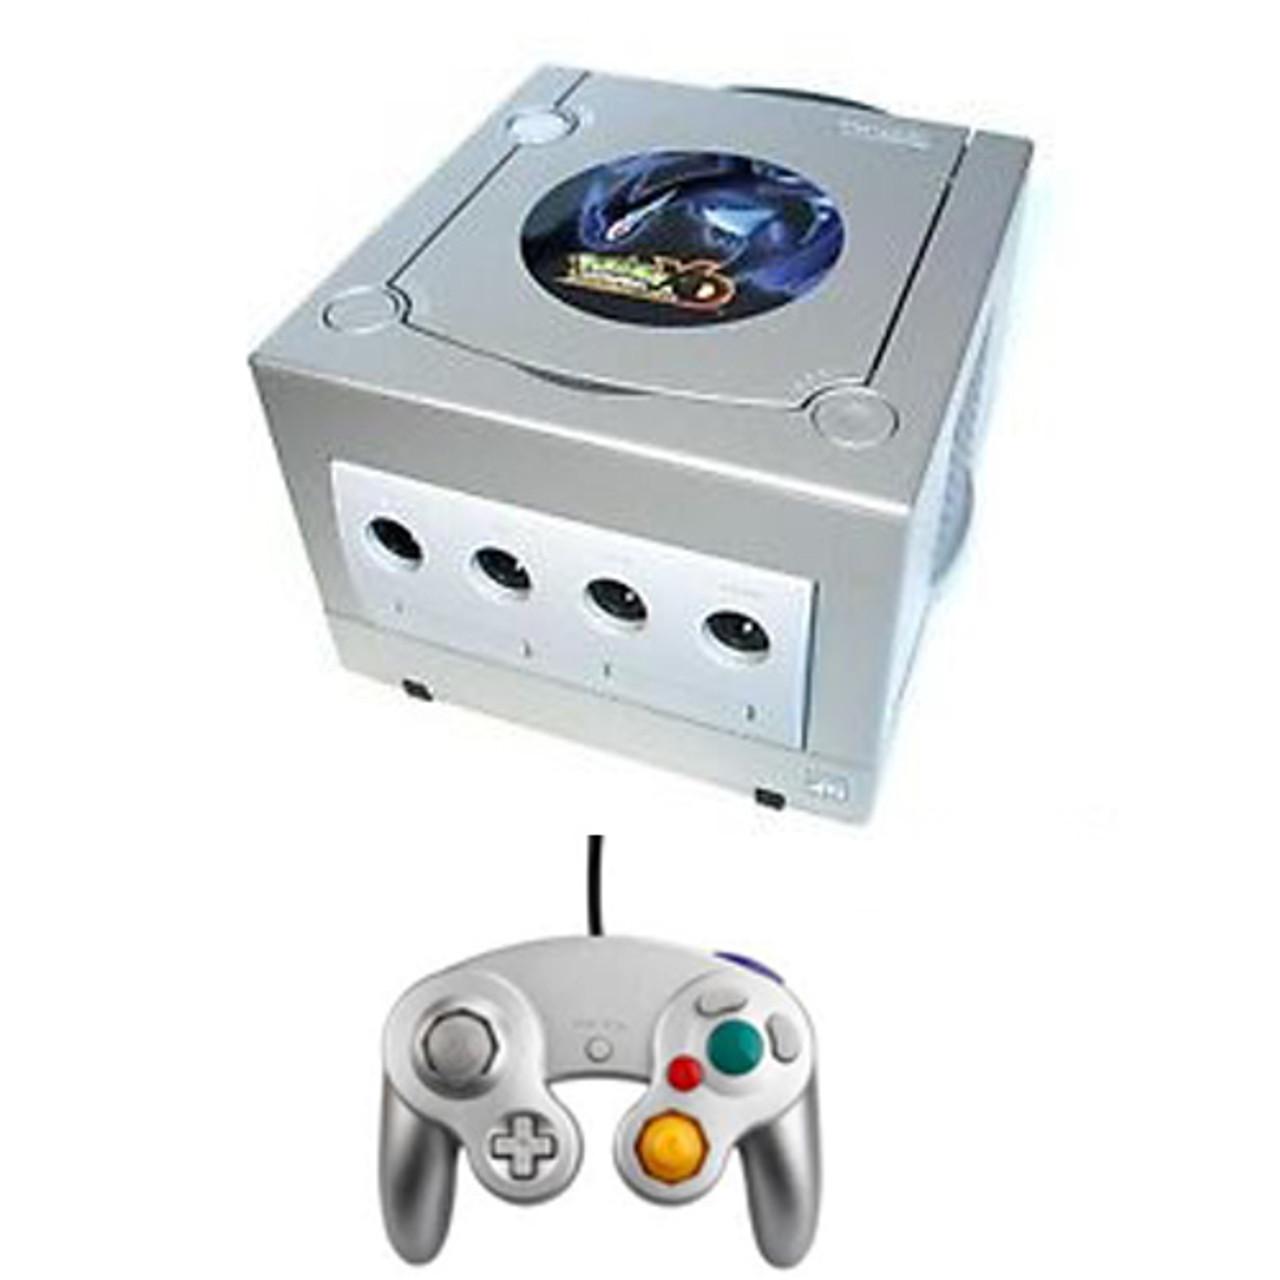 Nintendo gamecube platinum pokemon xd player pak for sale - Gamecube pokemon xd console ...